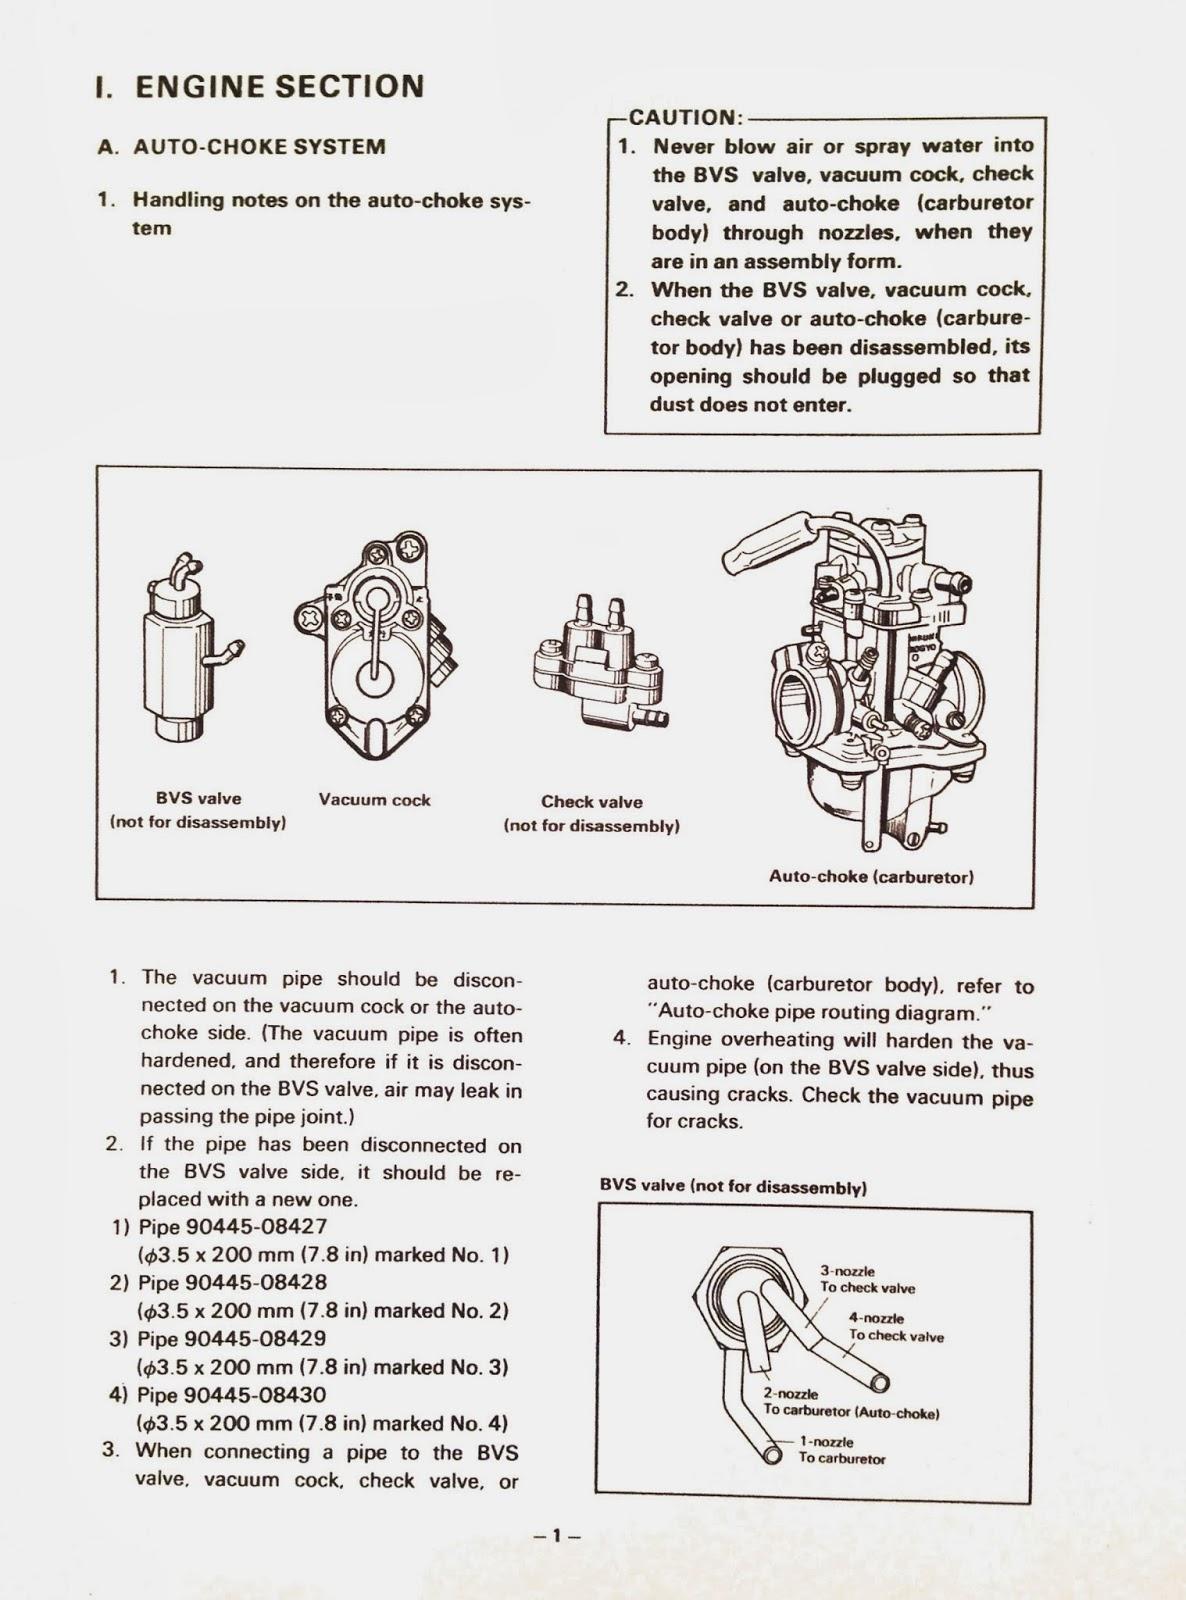 yamaha lc50 yamaha lc50 service manual rh yamahalc50 blogspot com Yamaha ATV Wiring Diagram Yamaha ATV Wiring Diagram